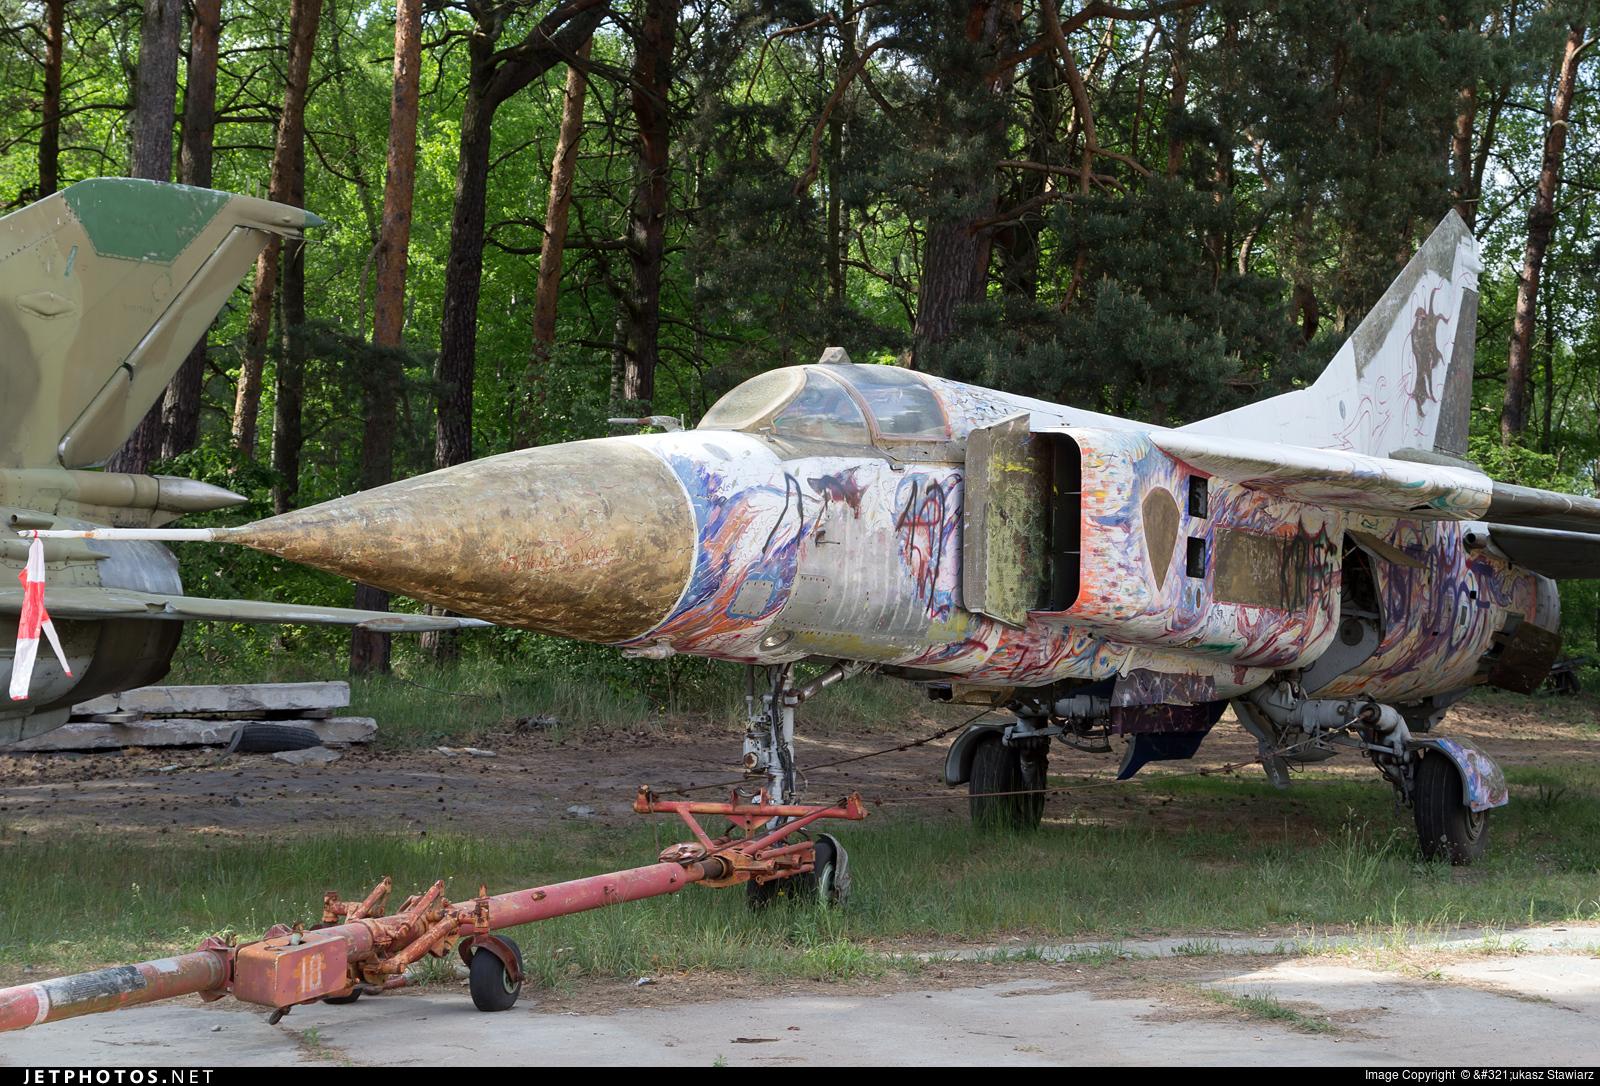 08 - Mikoyan-Gurevich MiG-23 Flogger - German Democratic Republic - Air Force